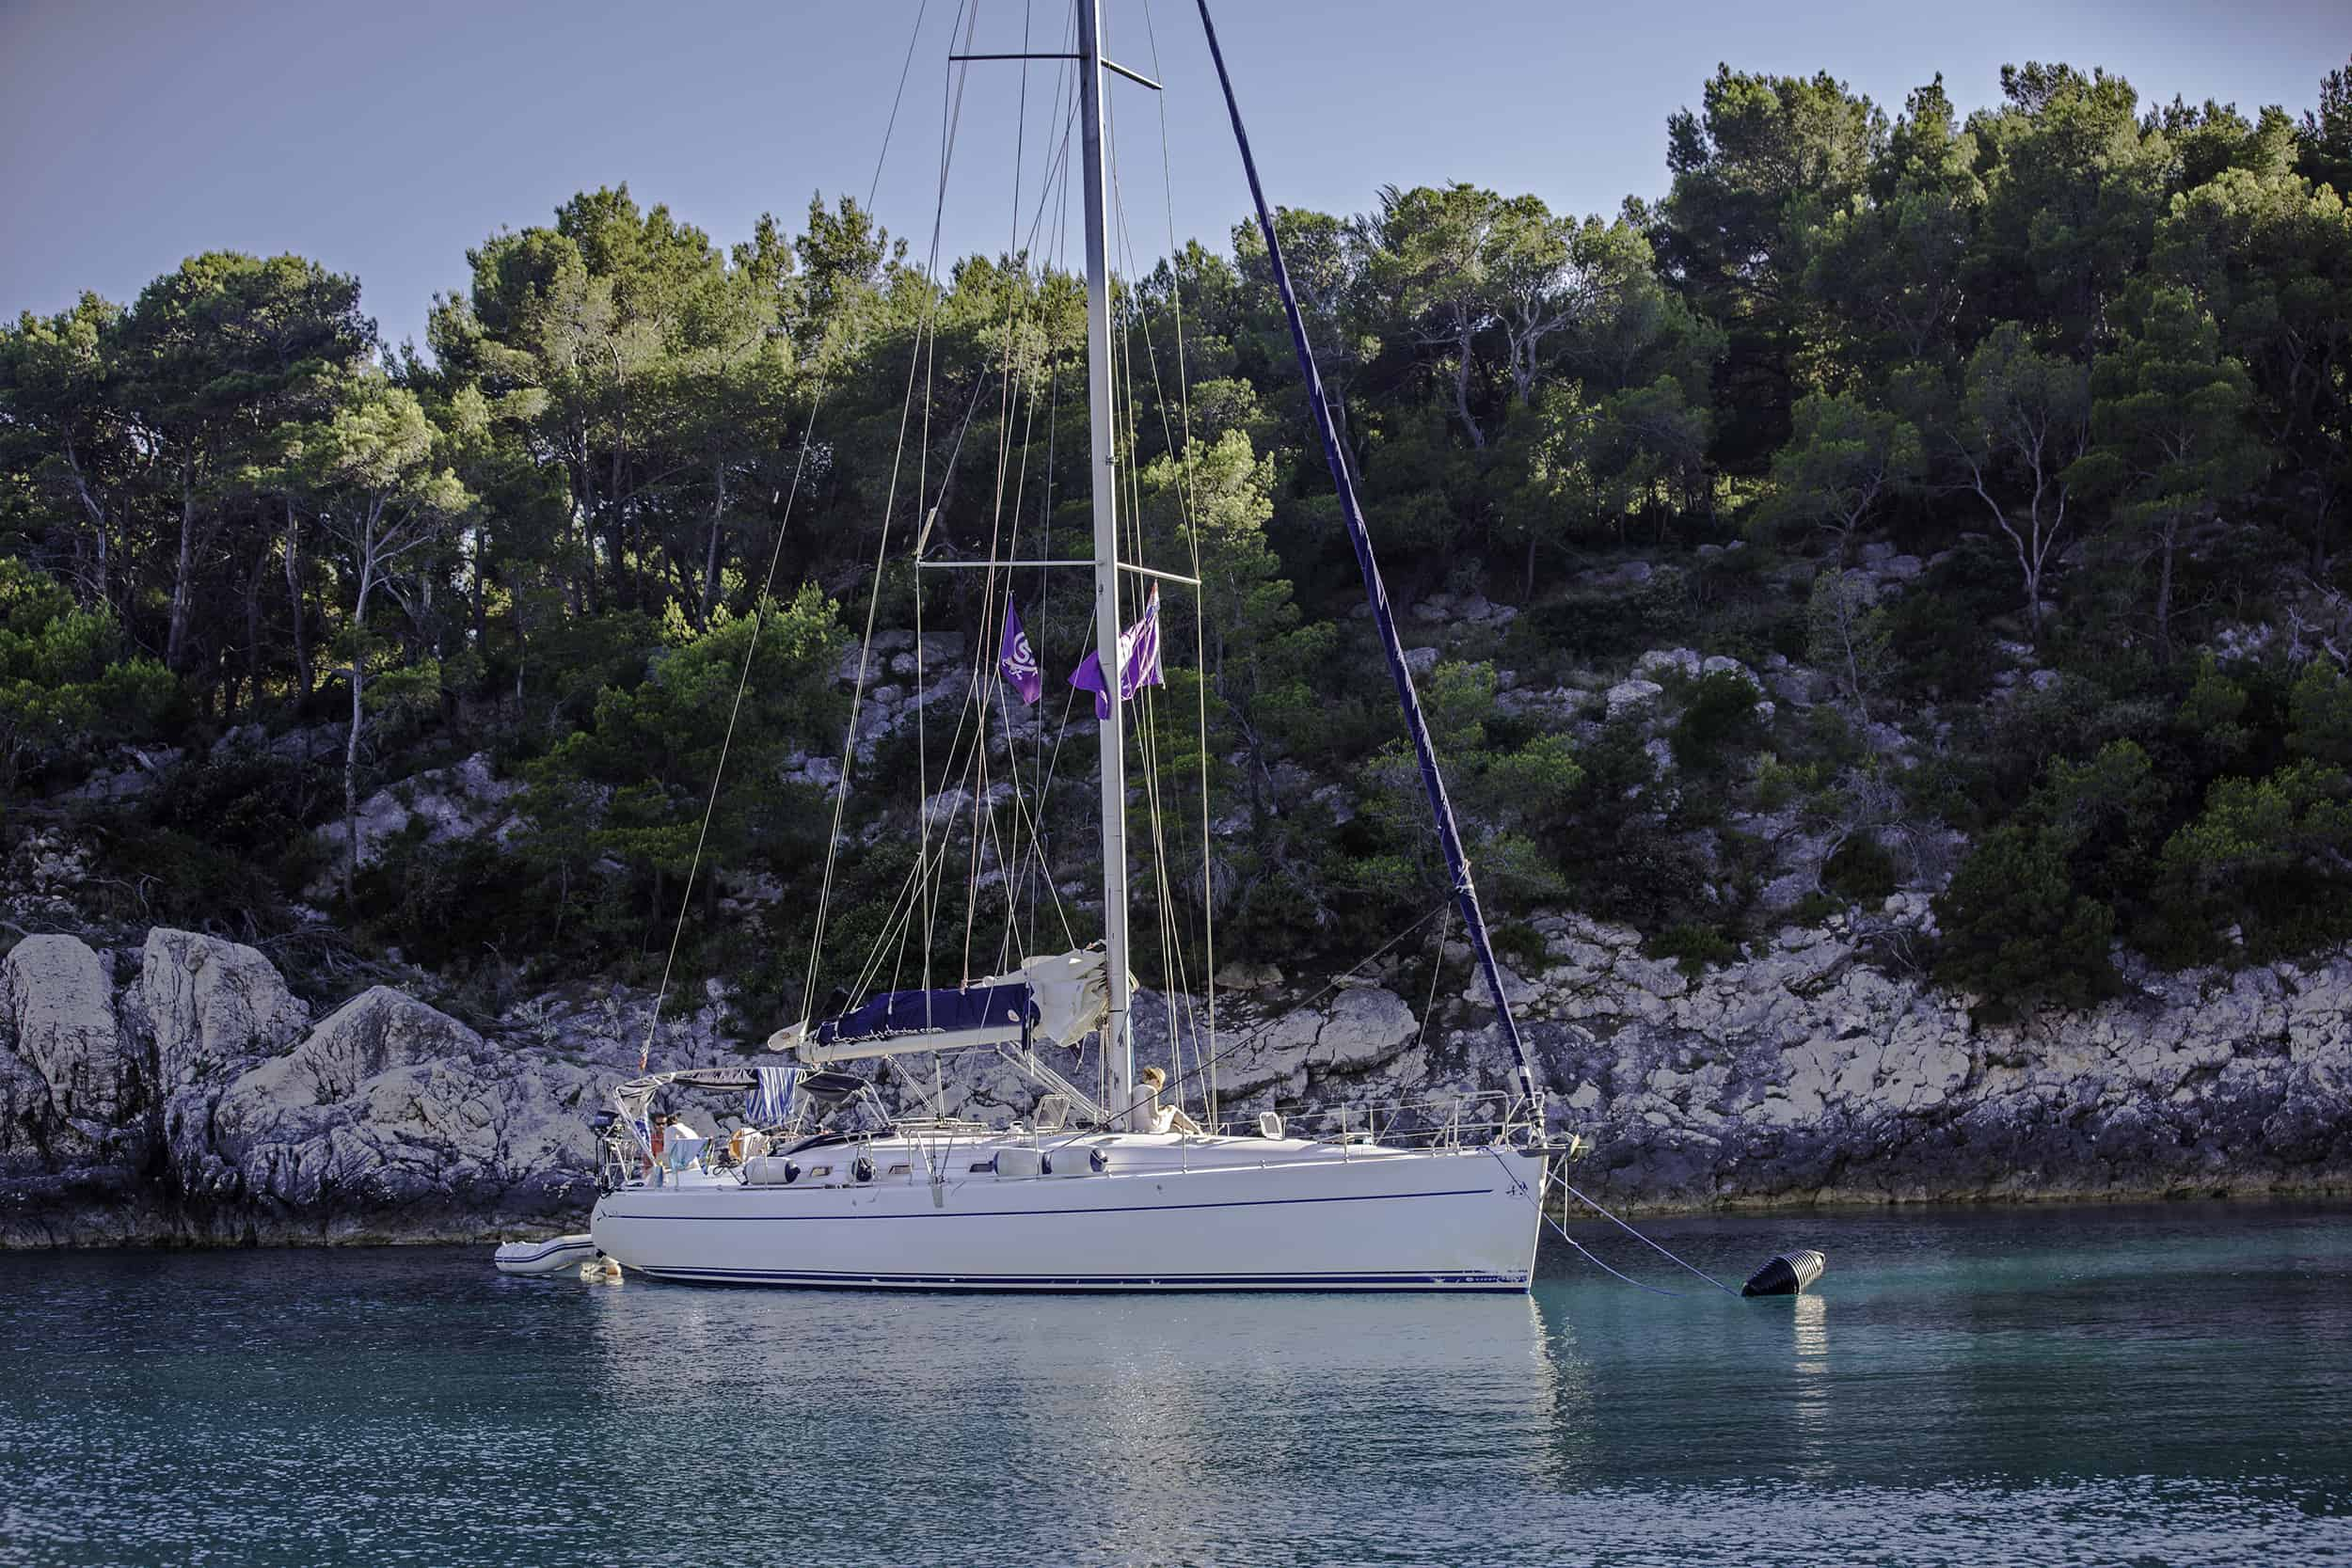 Attention, Sailors: G Adventures Launches New Mediterranean Trip